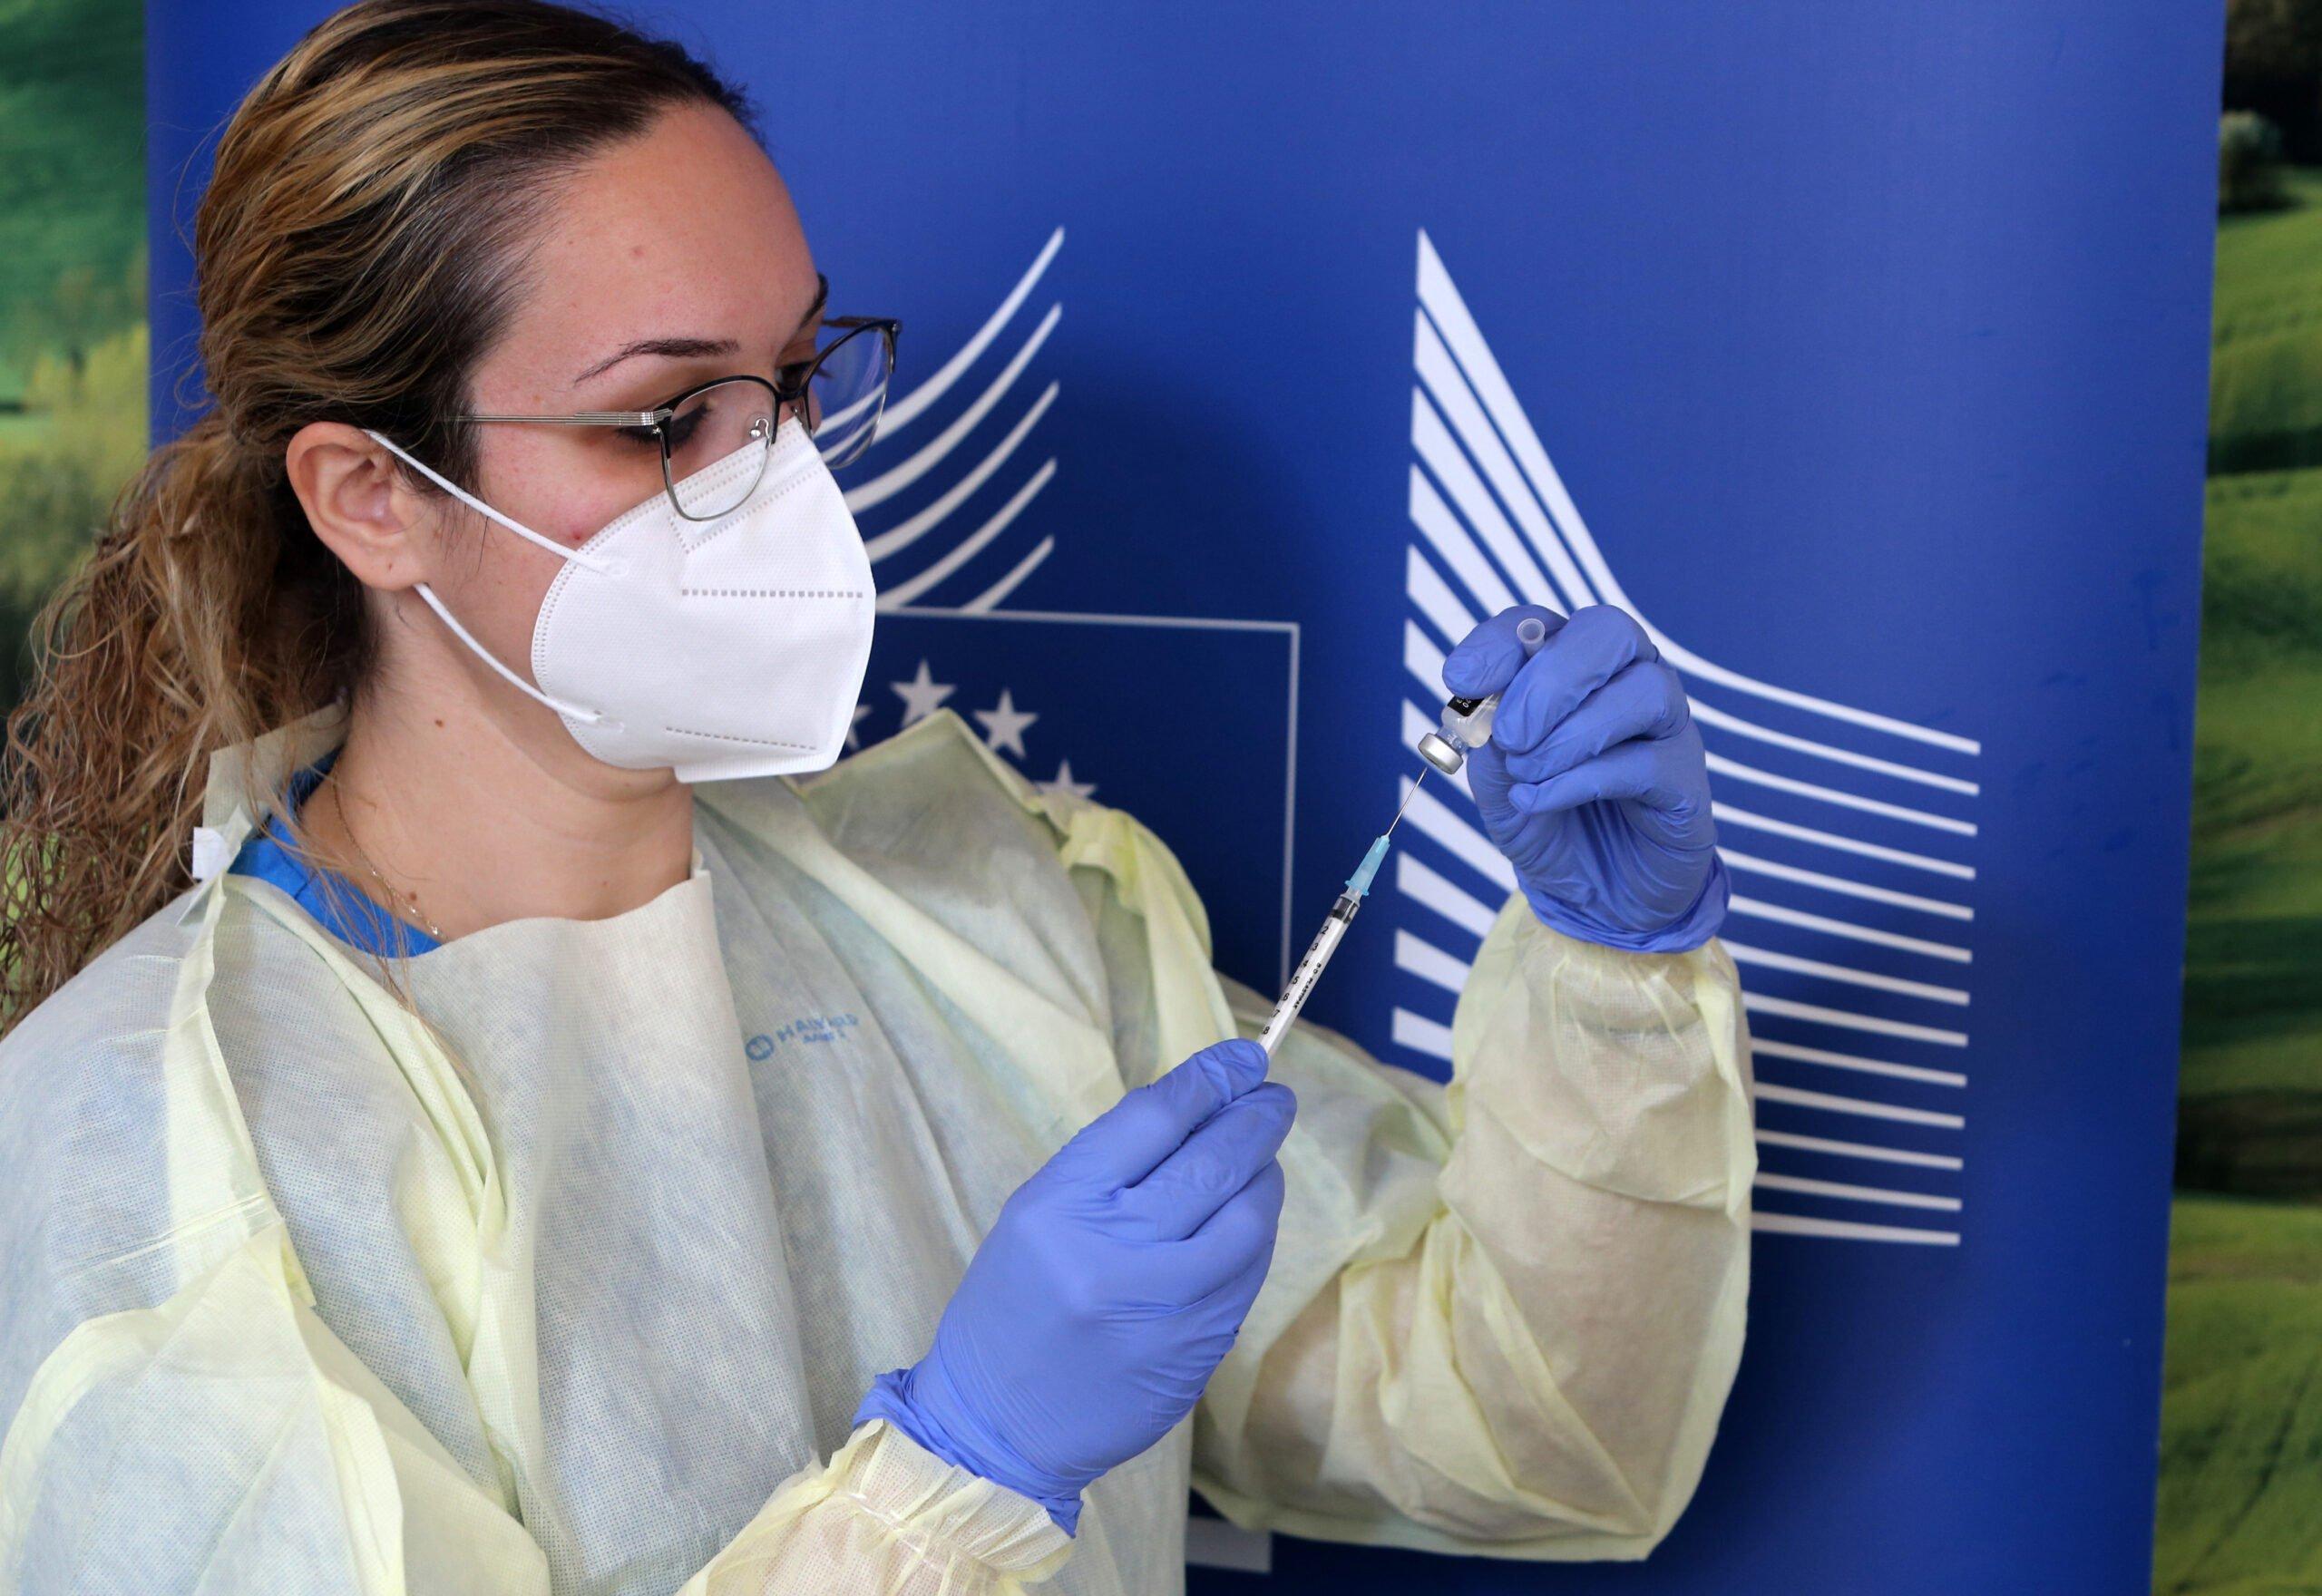 Coronavirus: Εμβολιασμοί για να σπάσει τα 200.000 σημάδια την Πέμπτη